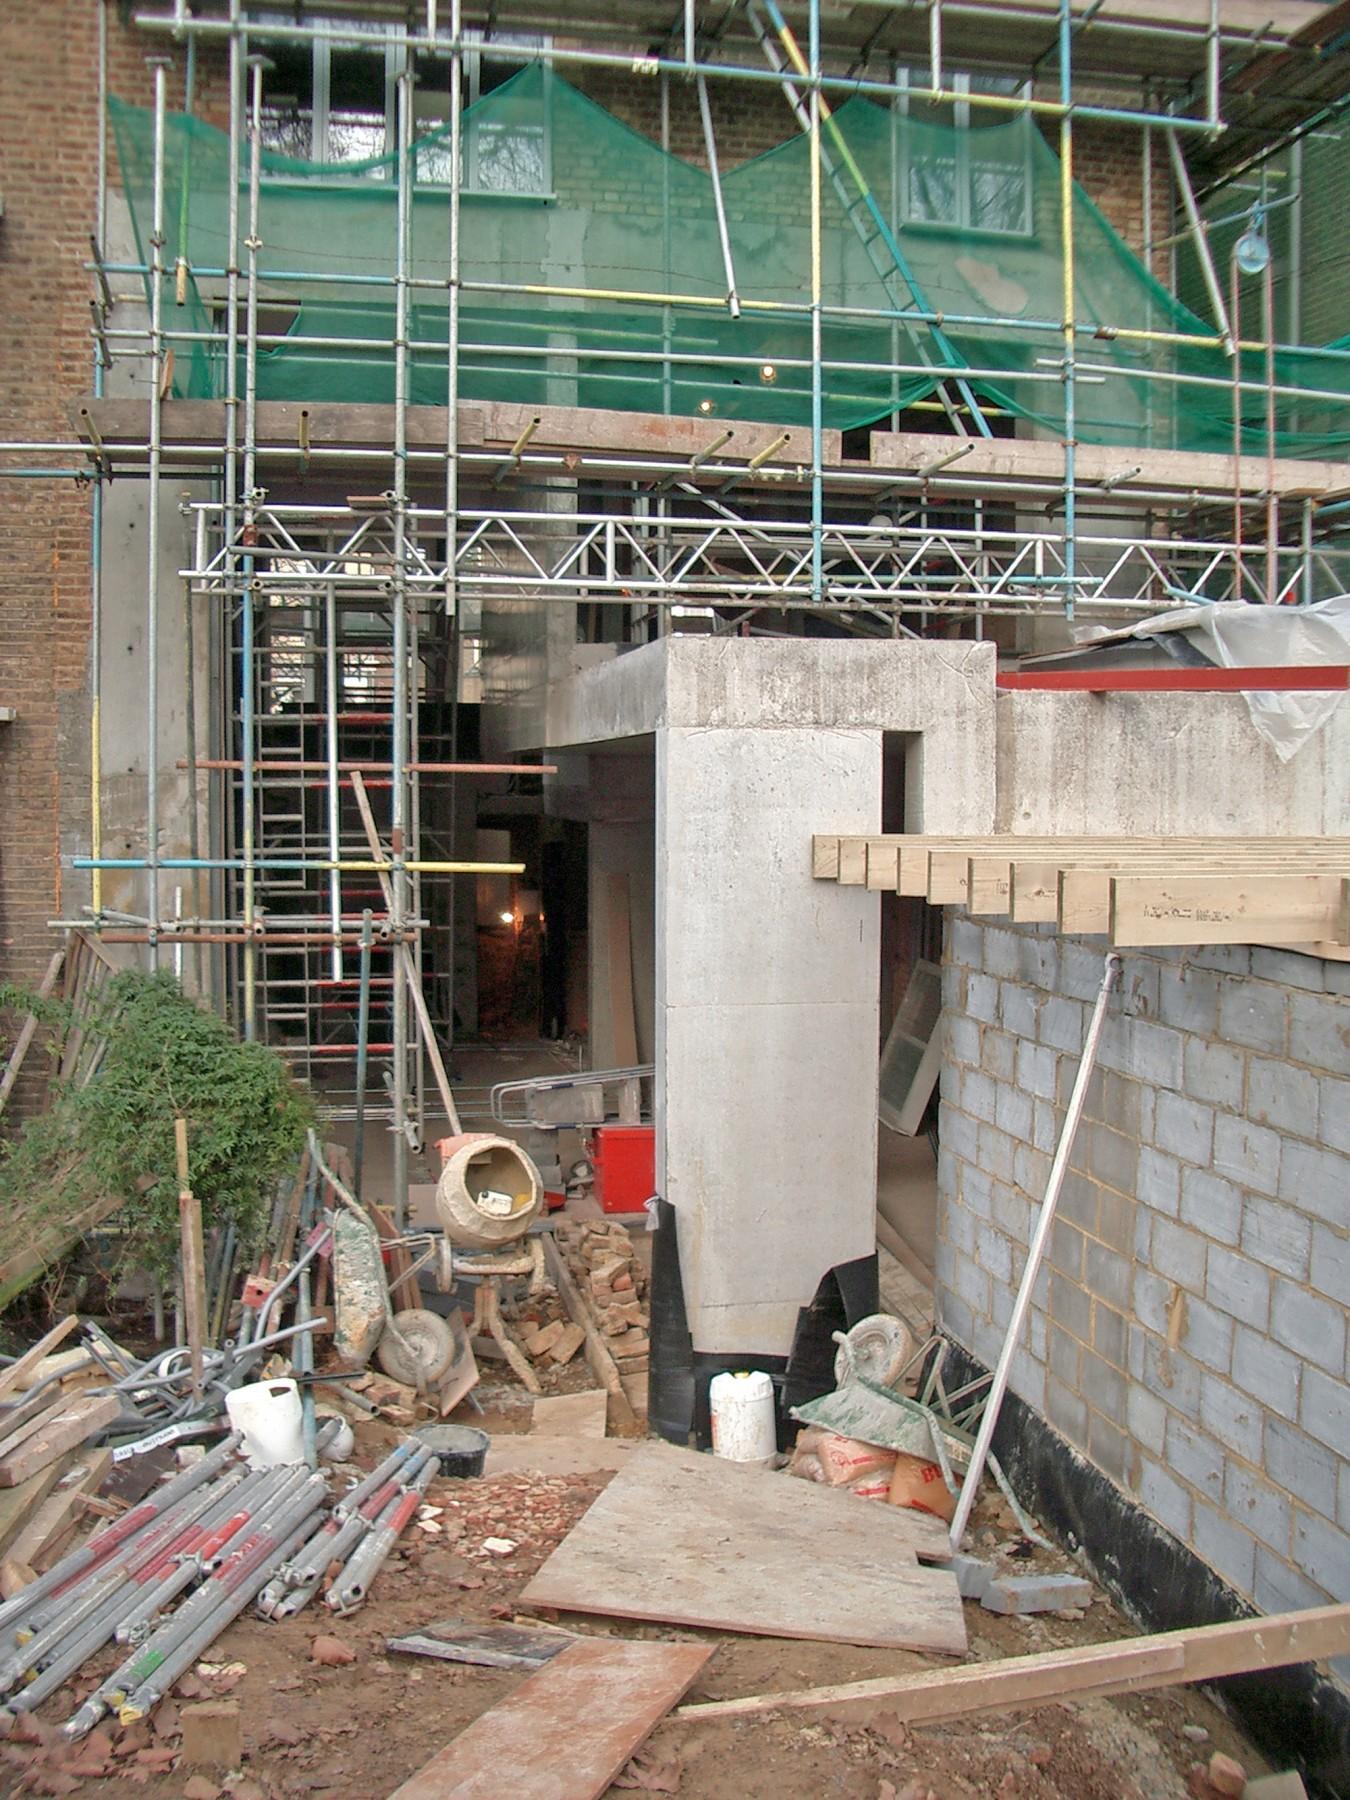 Kander-house-Primrose-hill-London-residential-home-contemporary-interior-Riba-award-victorian-Jamie-Fobert-Architects-construction-site